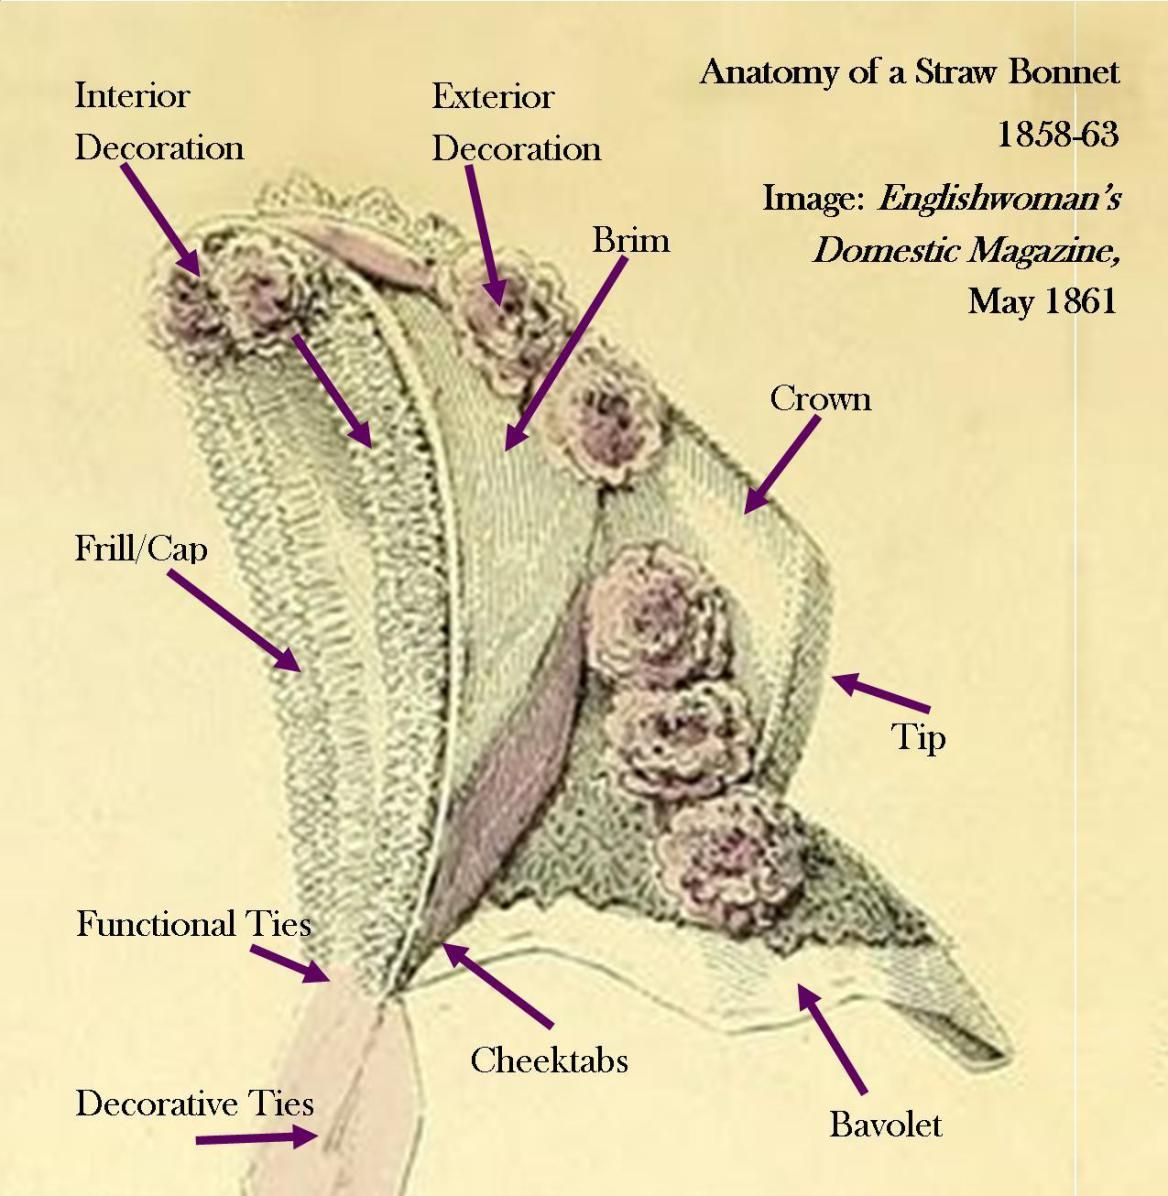 Anatomy Of A Straw Bonnet